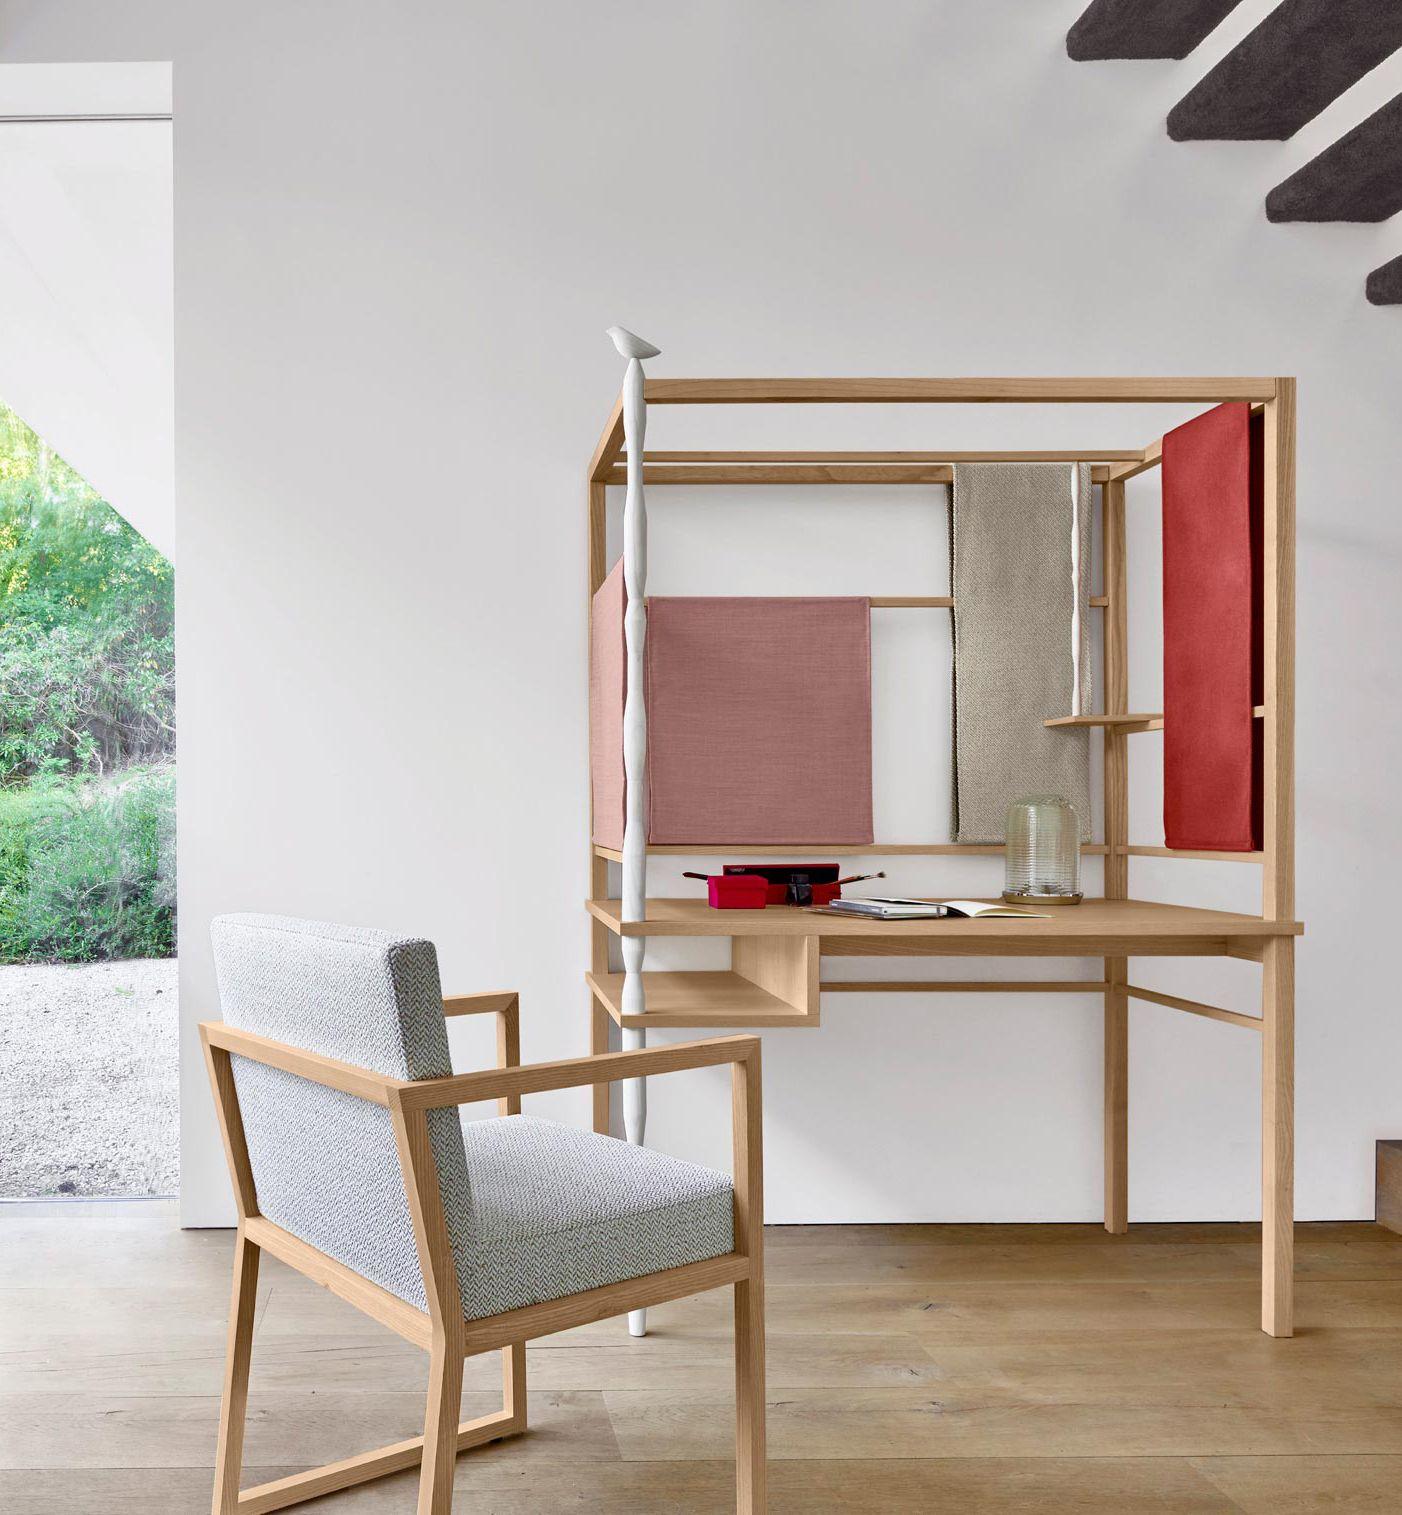 Koya Desk In Natural Ash, Designed By Marie Christine Dorner. | Available  At Linea. Office InspoThe DeskOfficesEnvironmentDesksModern FurnitureAshLos  ...